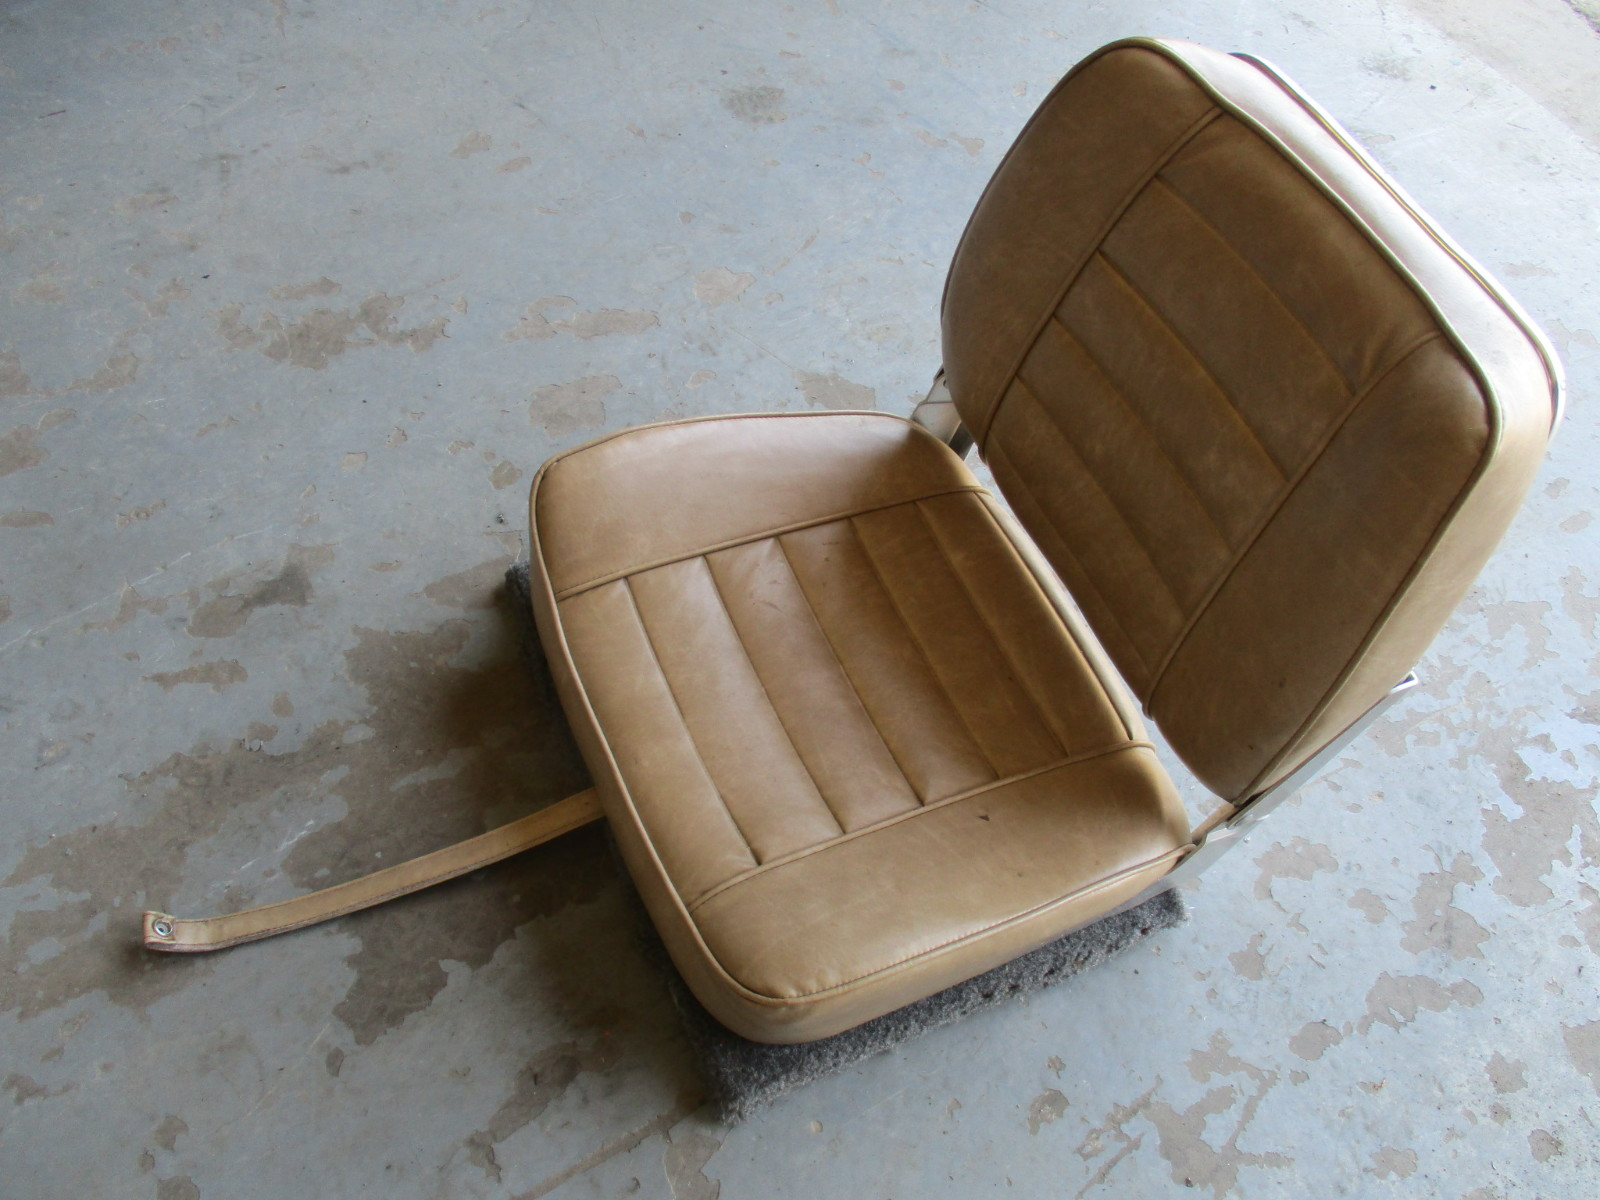 1972 Larson Boat Folding Pedestal Seat Brown/Tan